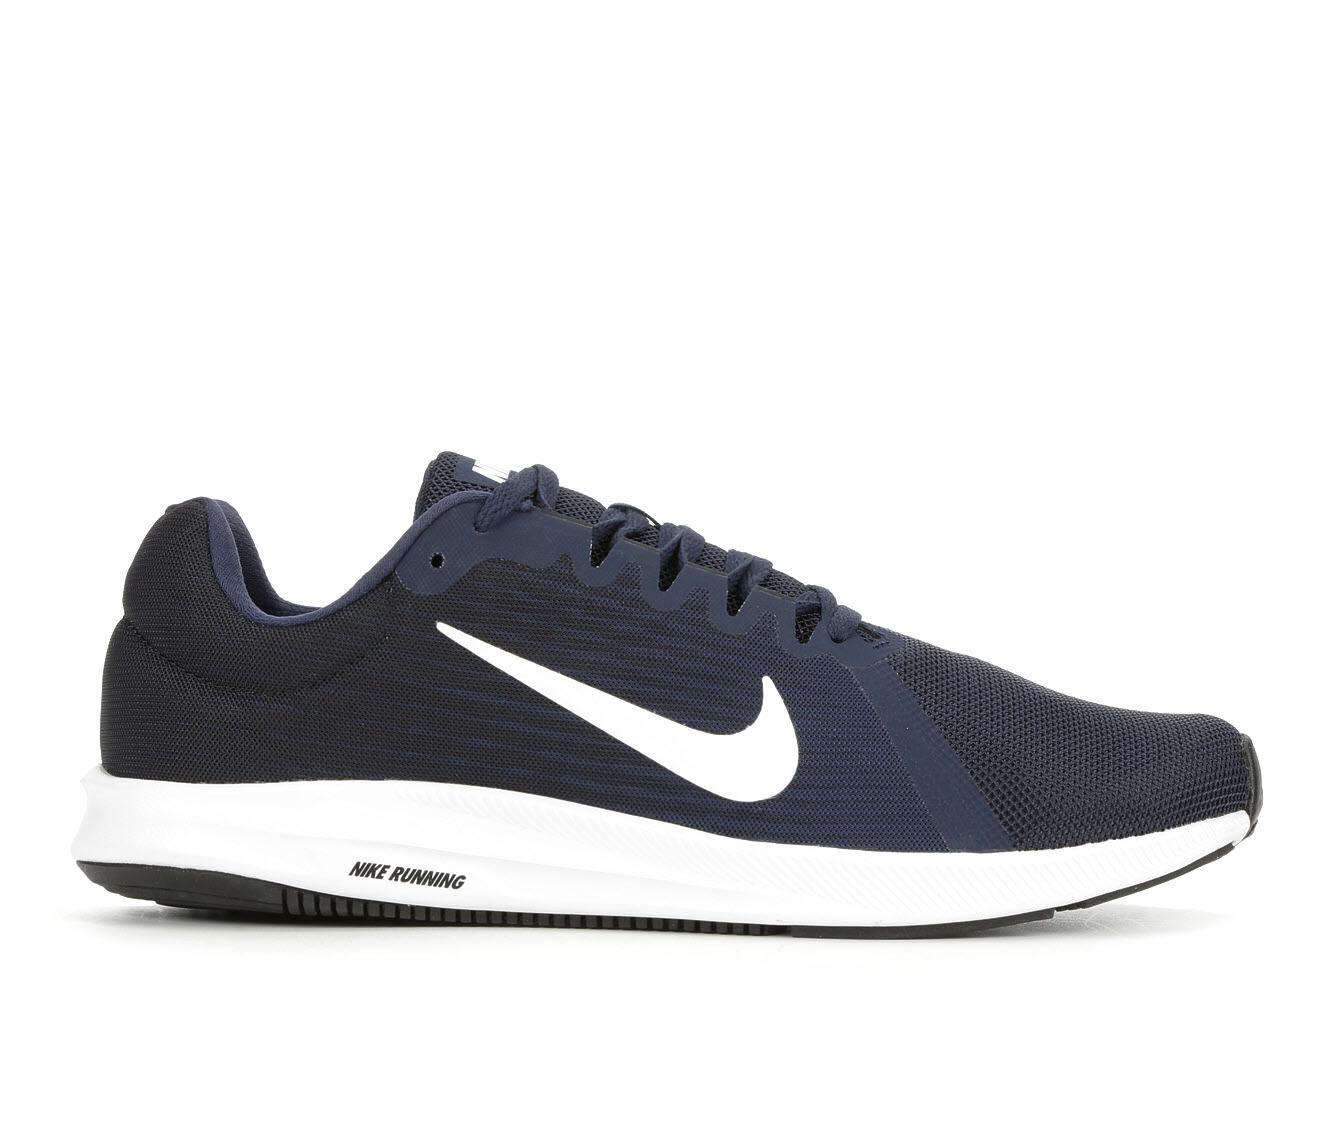 Men's Nike Downshifter 8 Running Shoes Navy/Black/Whit